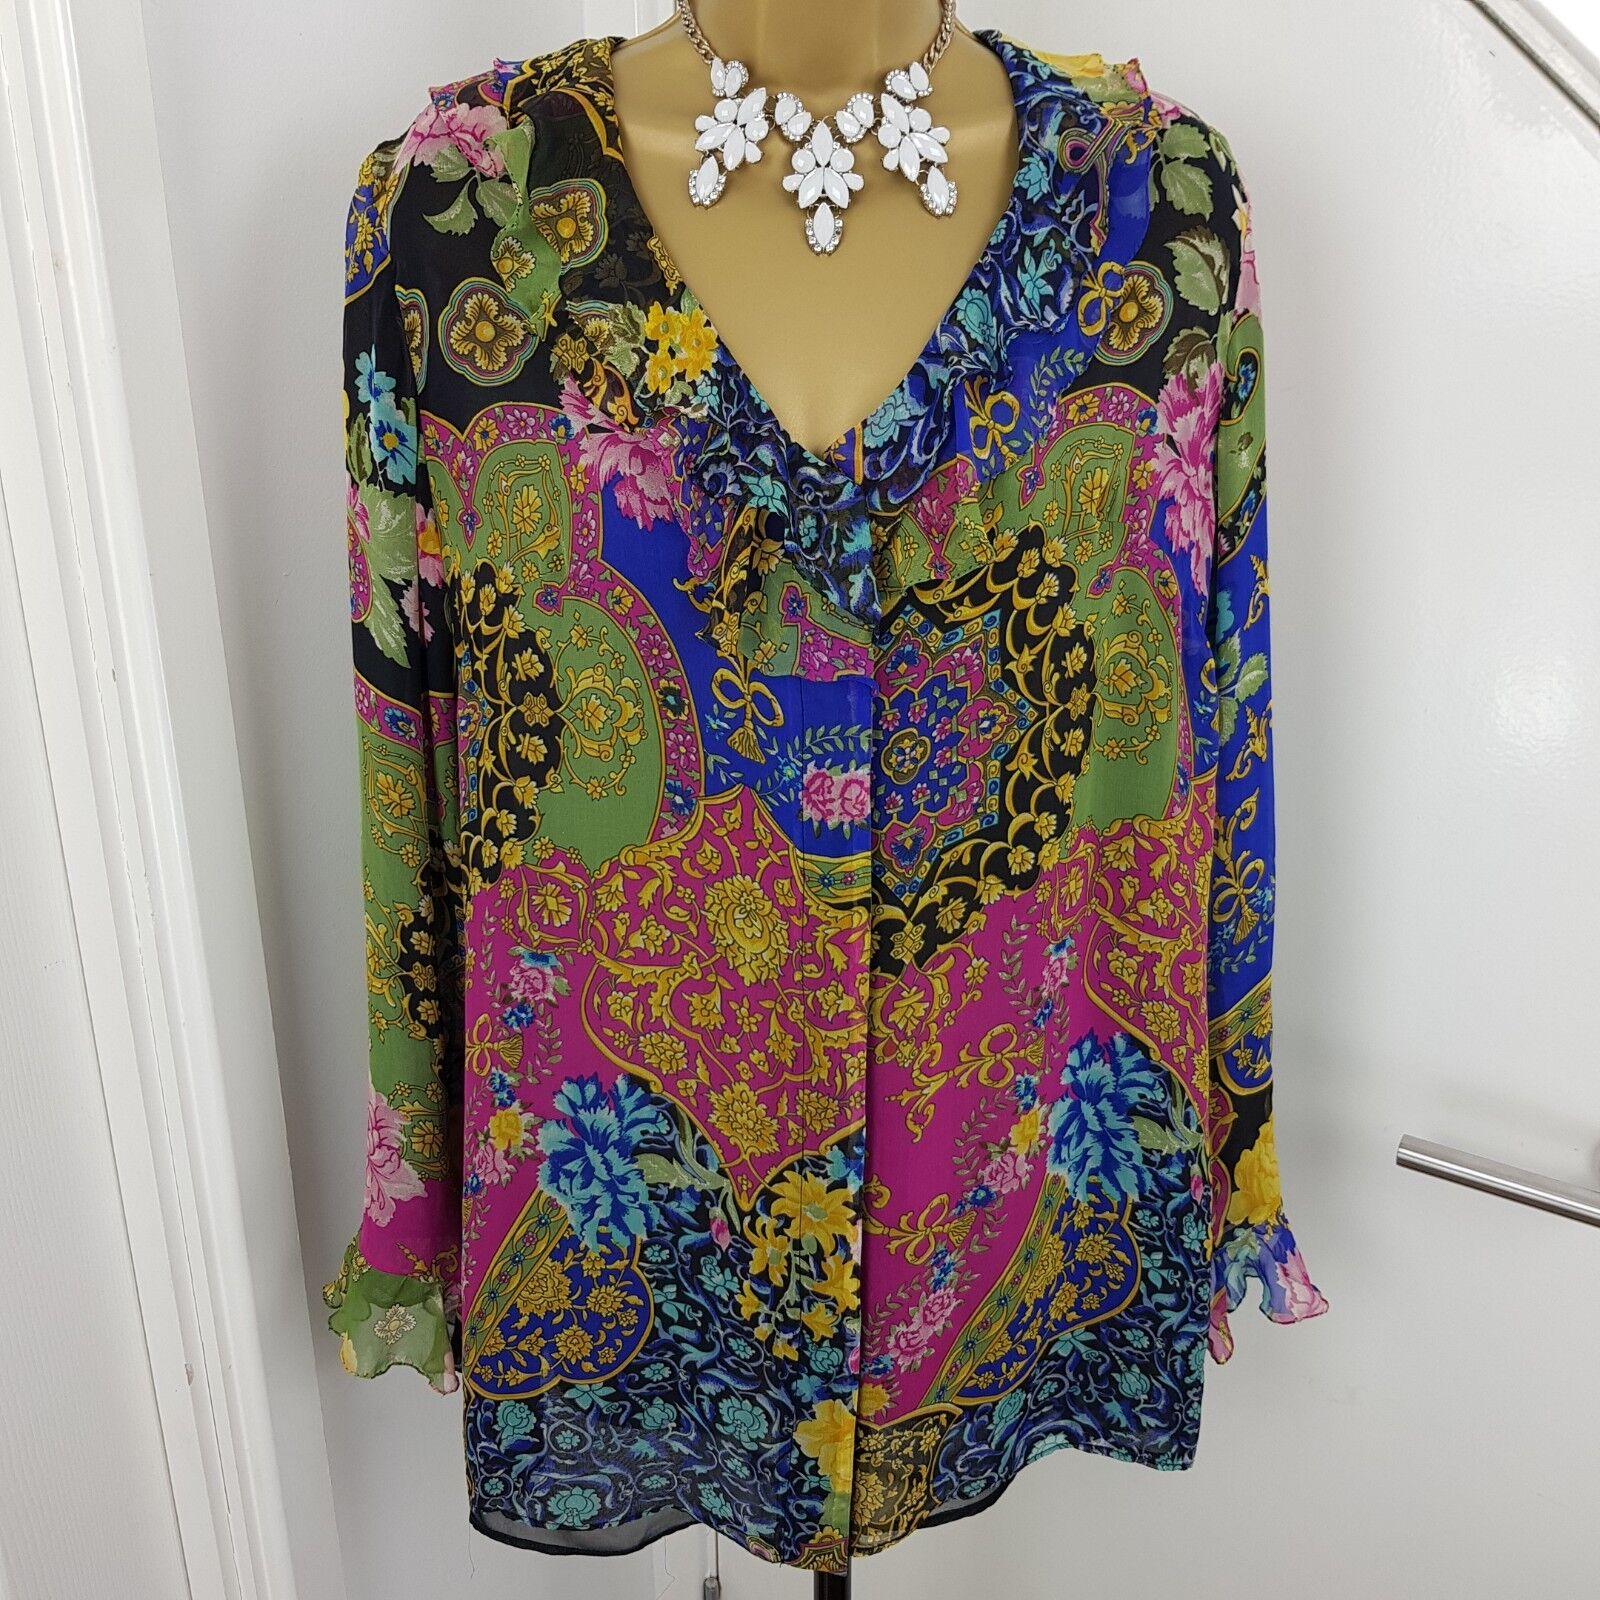 Leonard Cezair Couture Top Ruffle V Neck Buttoned Shirt Printed Größe